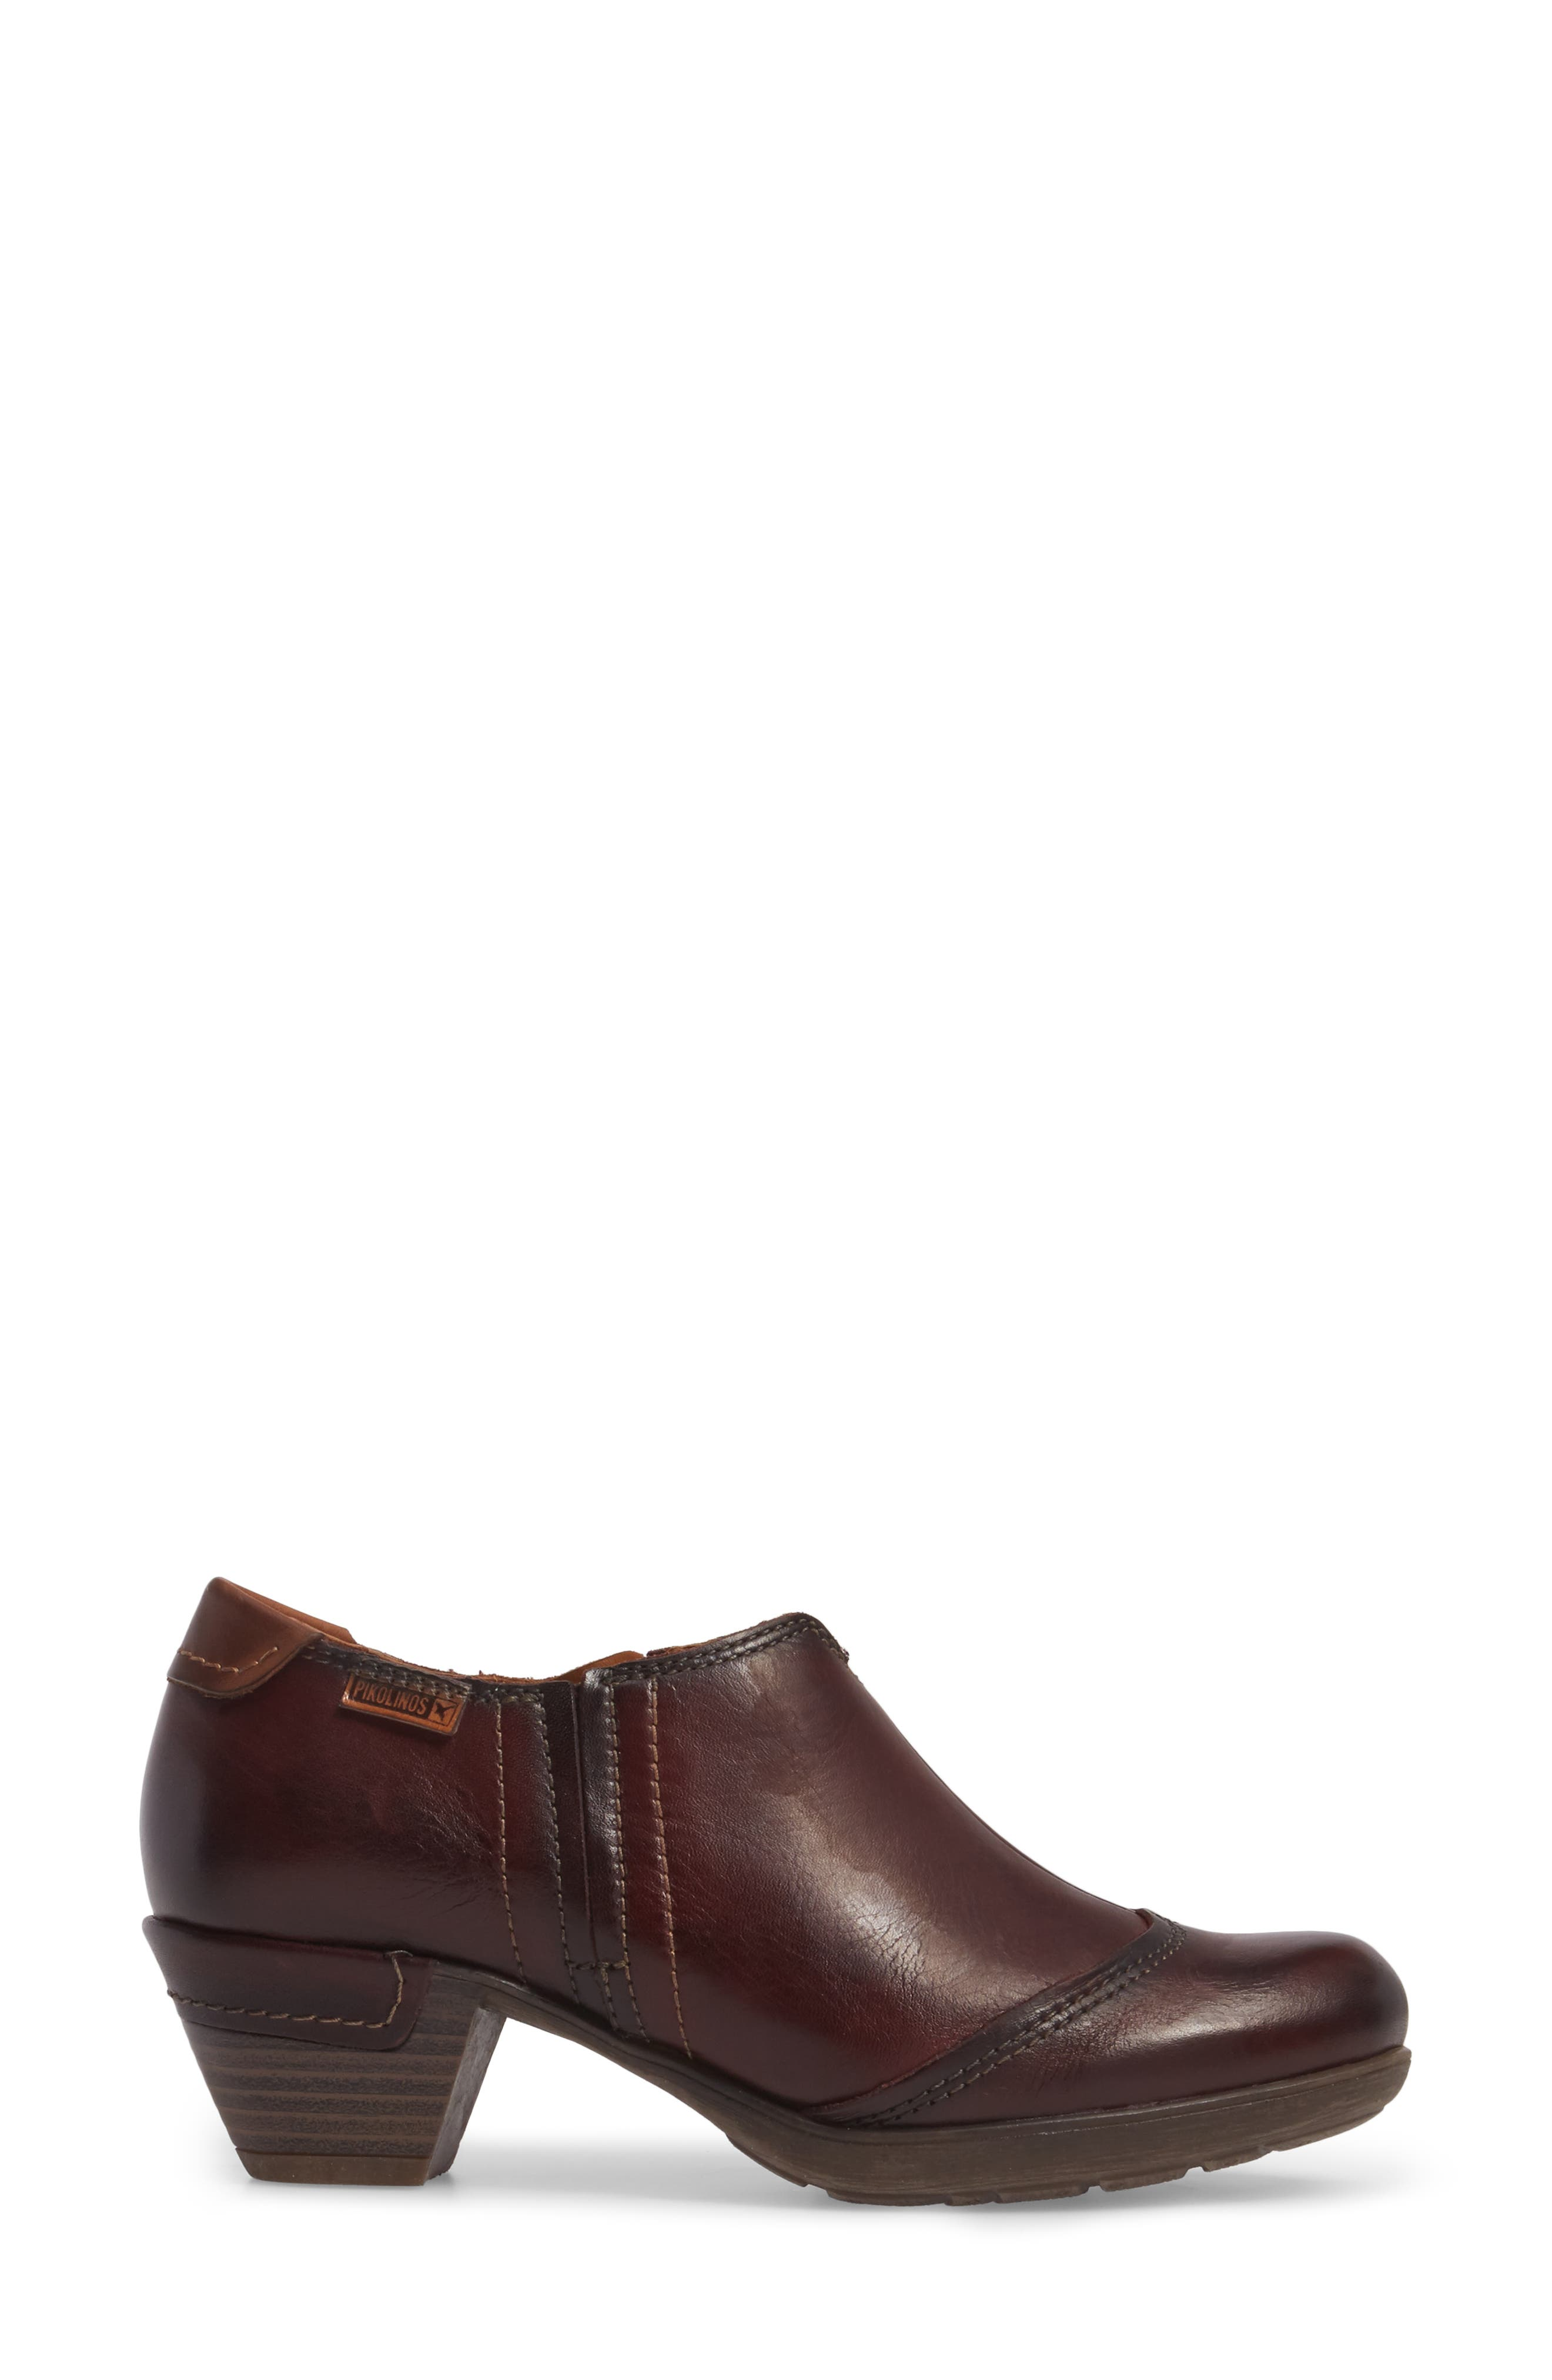 Rotterdam Bootie,                             Alternate thumbnail 3, color,                             Garnet Cuero Leather